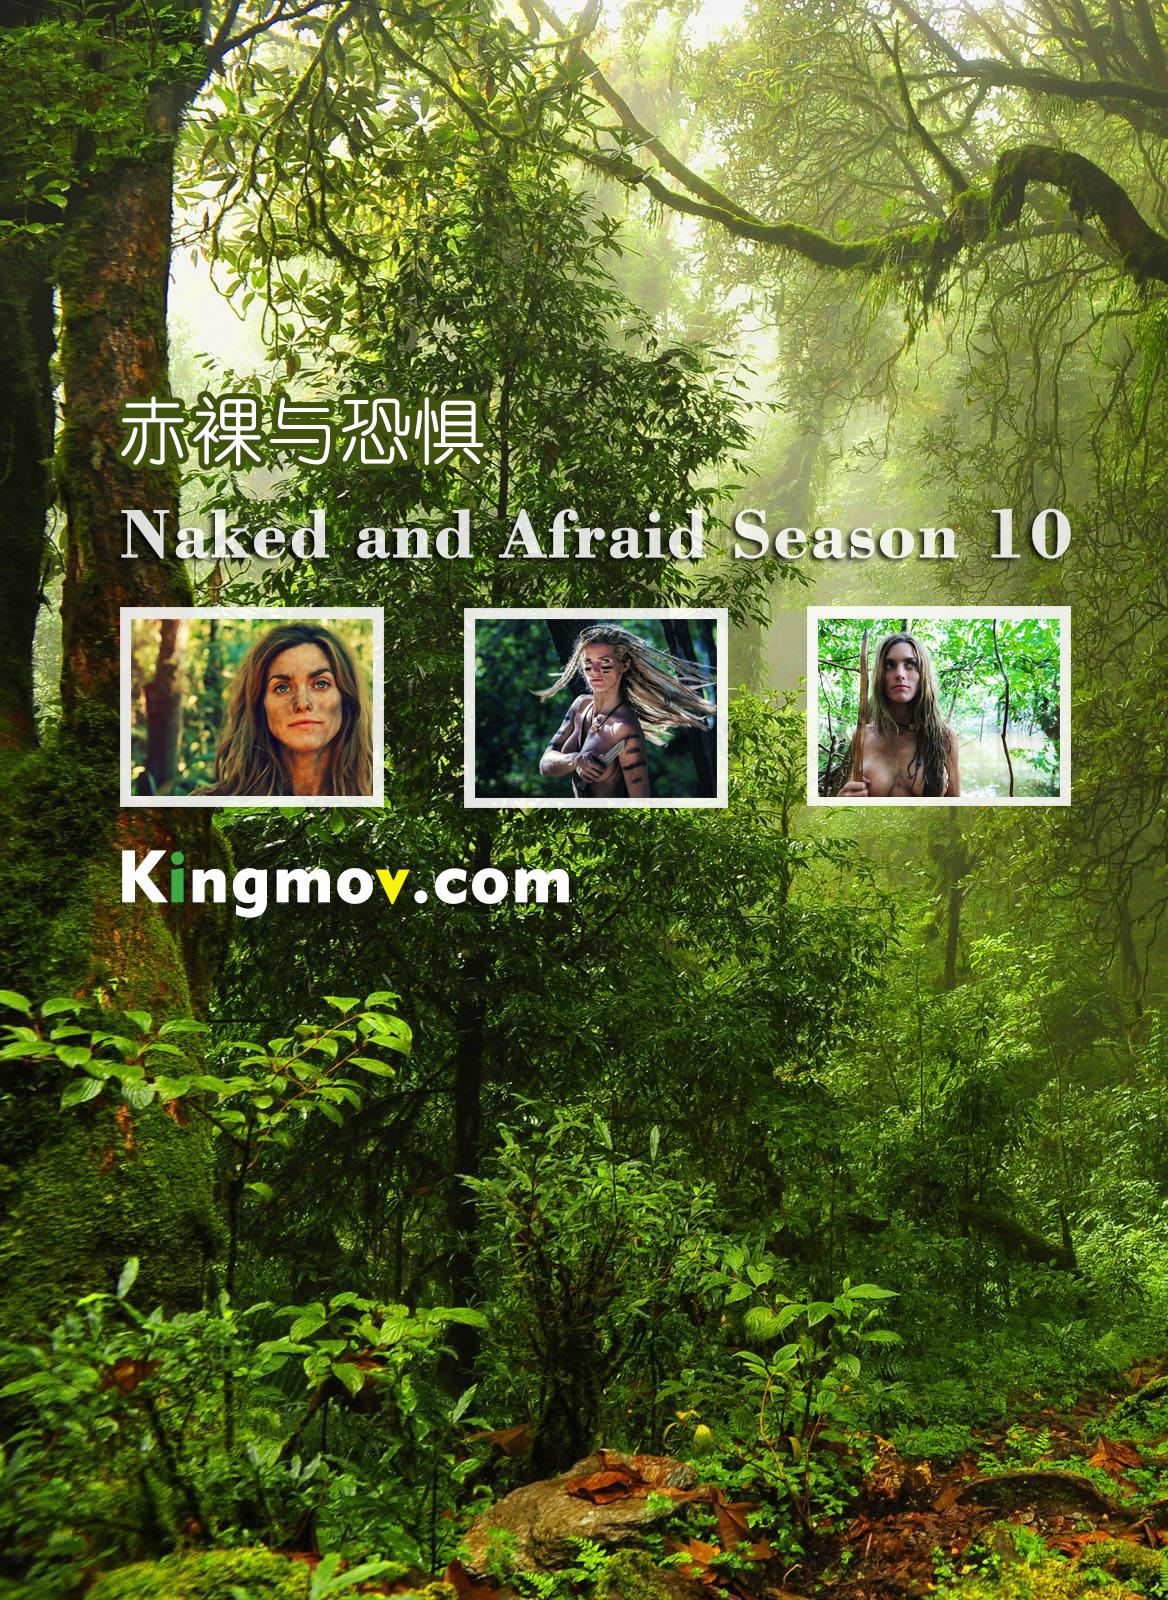 2019 美国《裸体求生 第十季》Naked and Afraid Season 10 全集下载